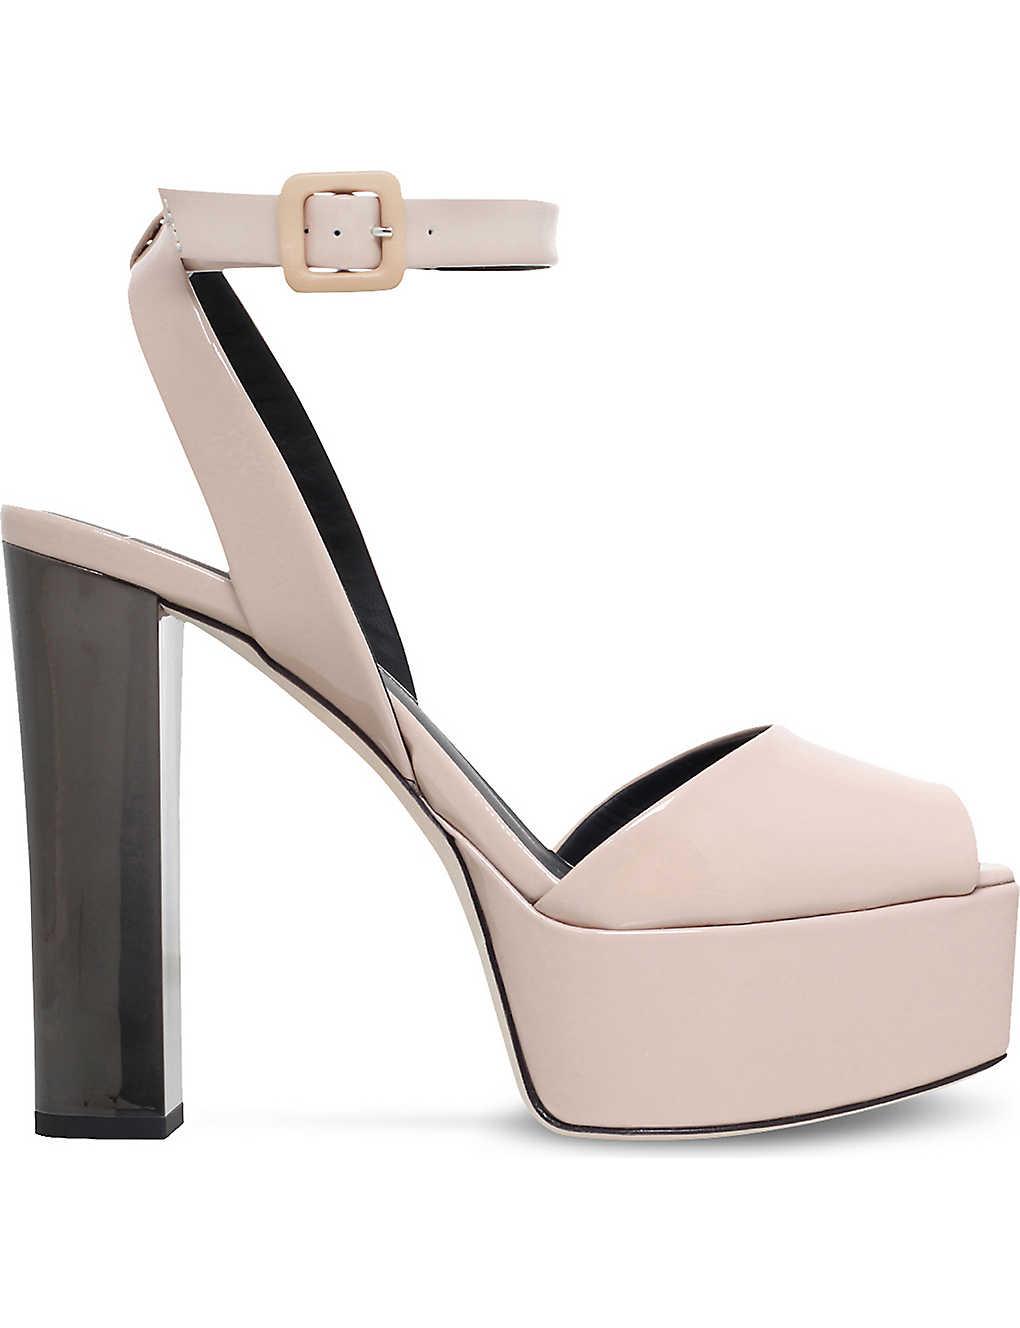 3705d05f55925 GIUSEPPE ZANOTTI - Betty platform patent leather sandals ...